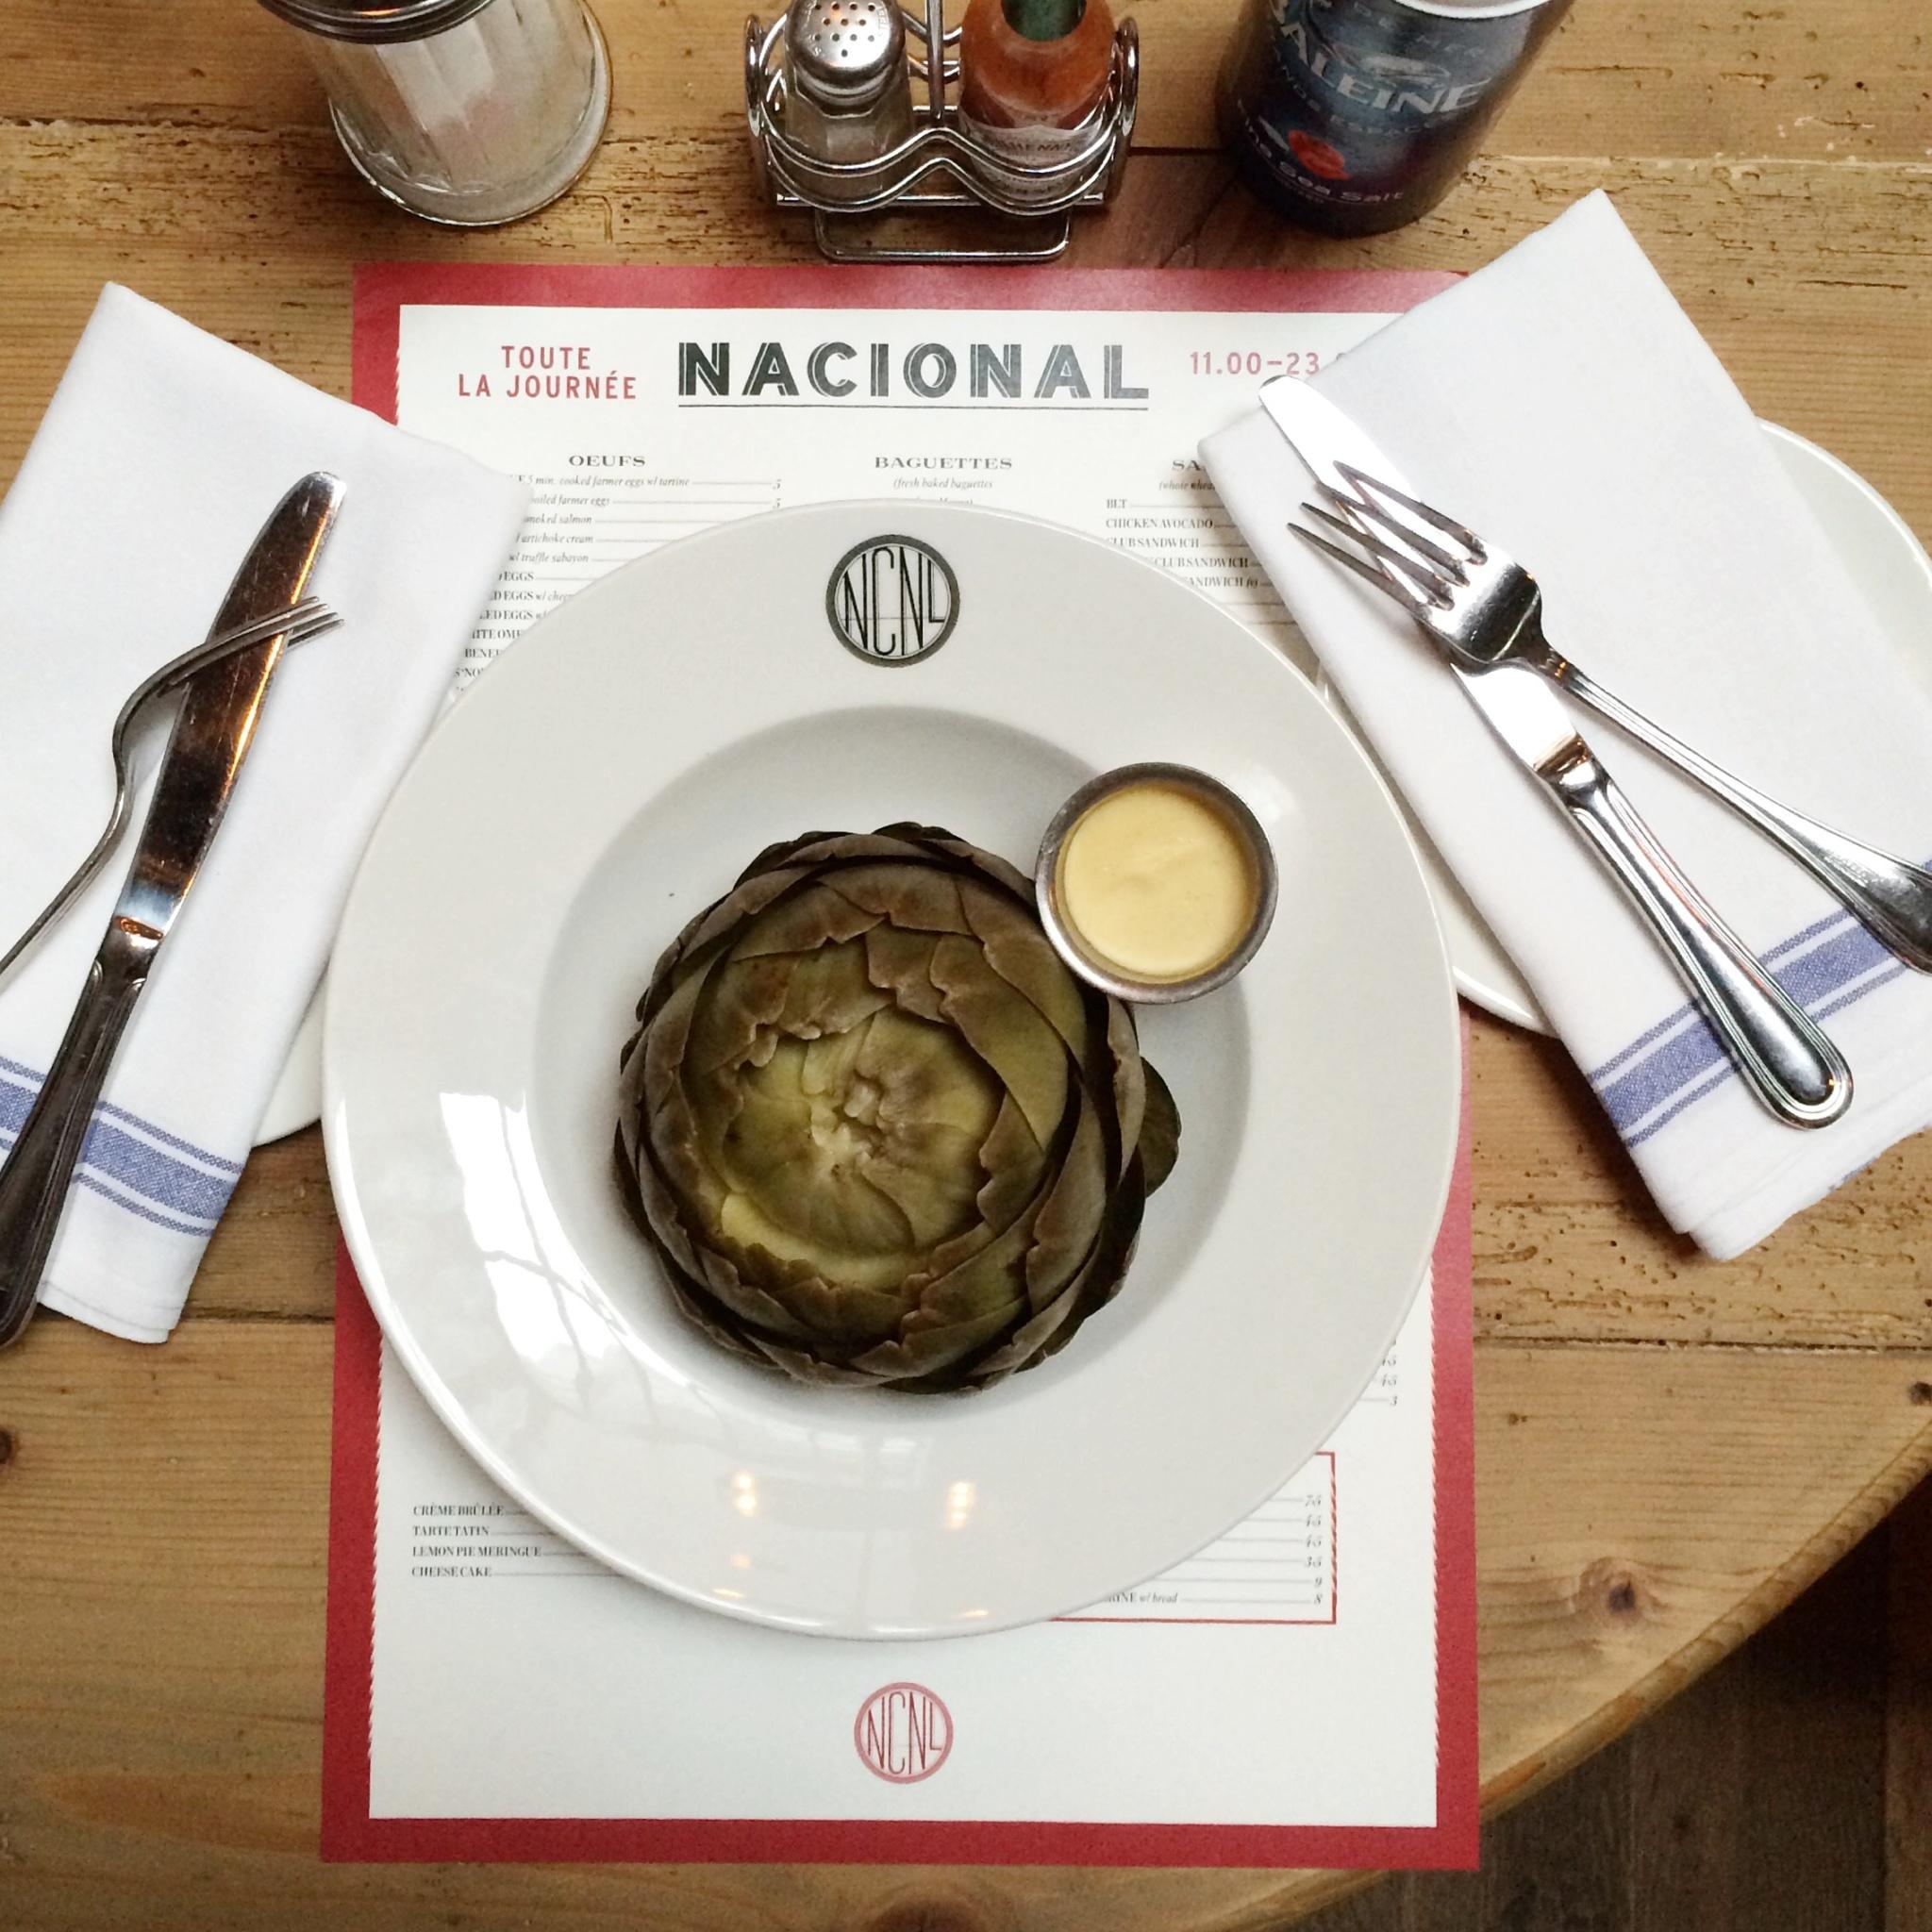 IMG 3145 - 020 Review: Nacional Amsterdam nieuwe kaart en ontbijt!